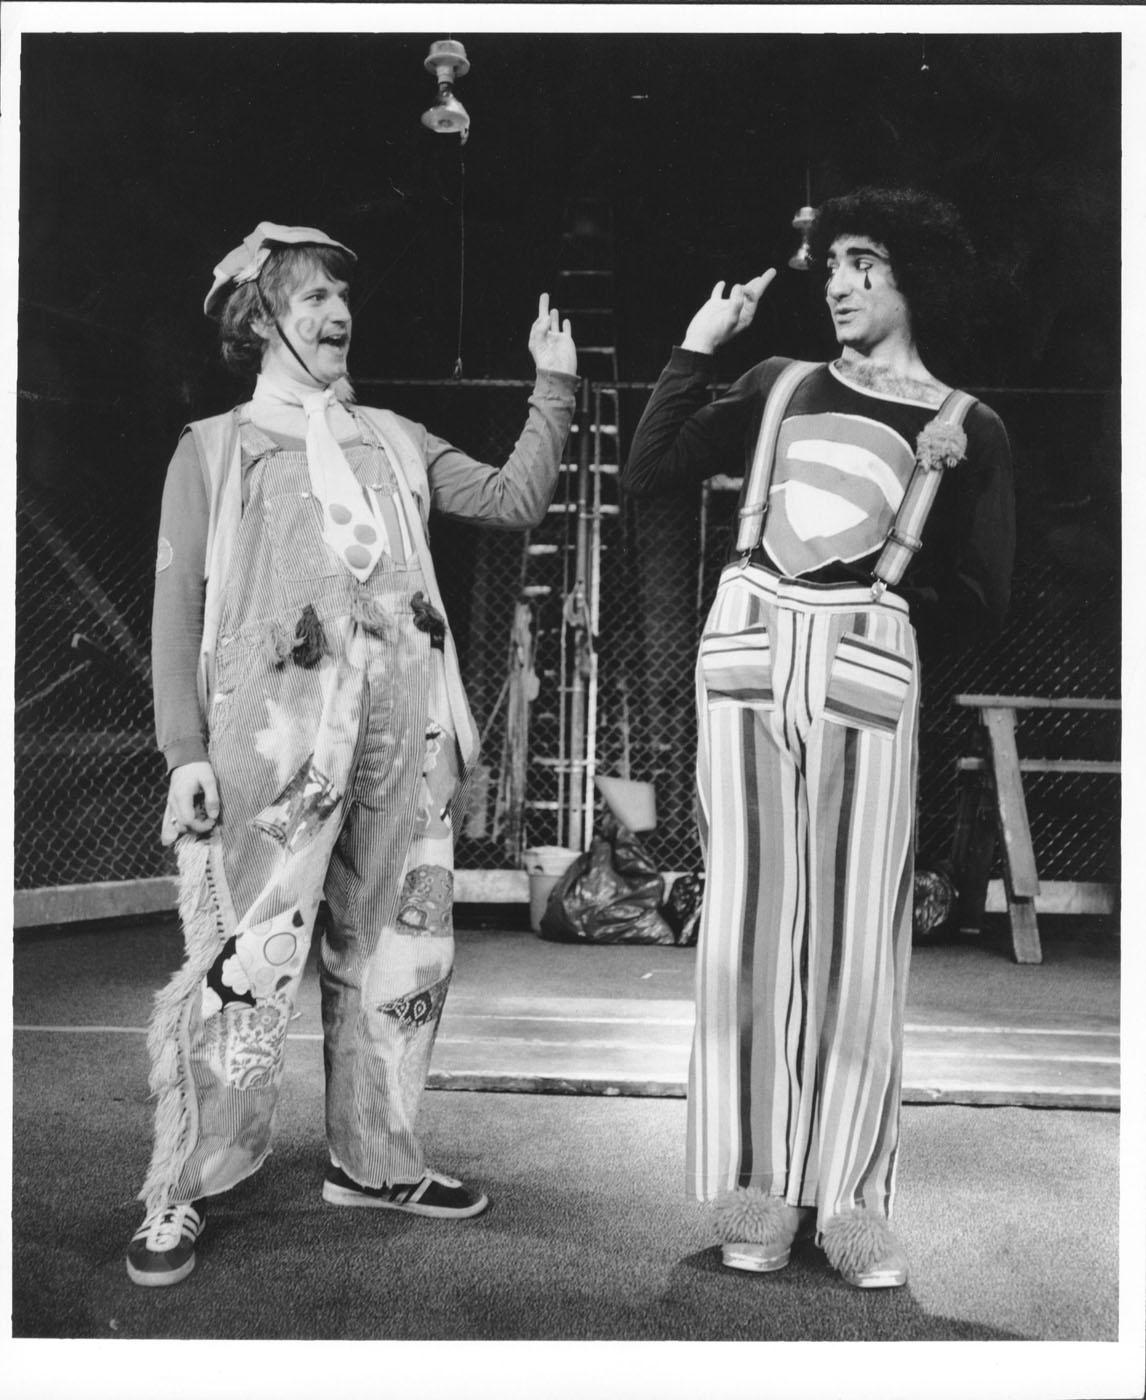 Dave & Gene Godspell 1973